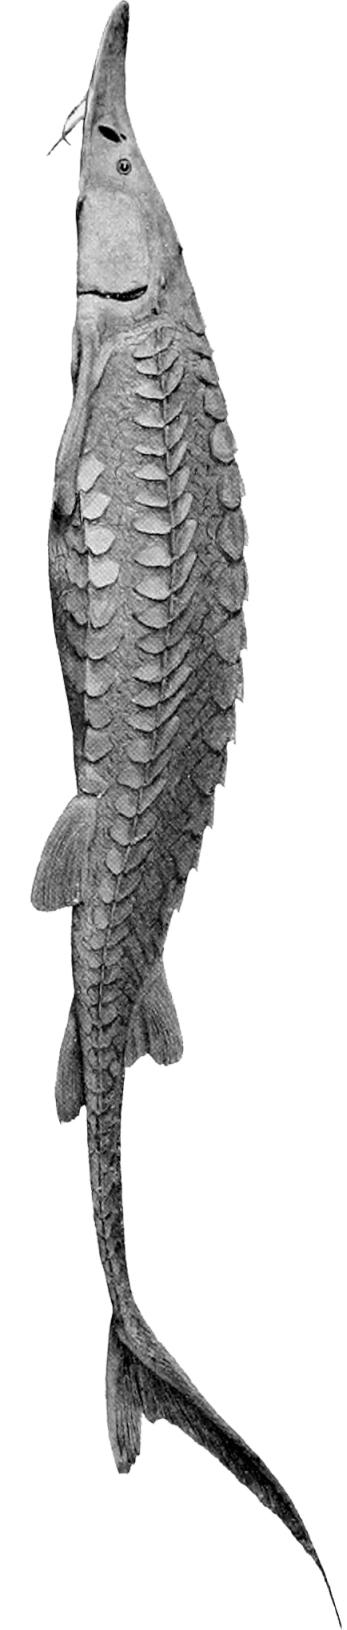 Scaphirhynchus_platorynchus copy